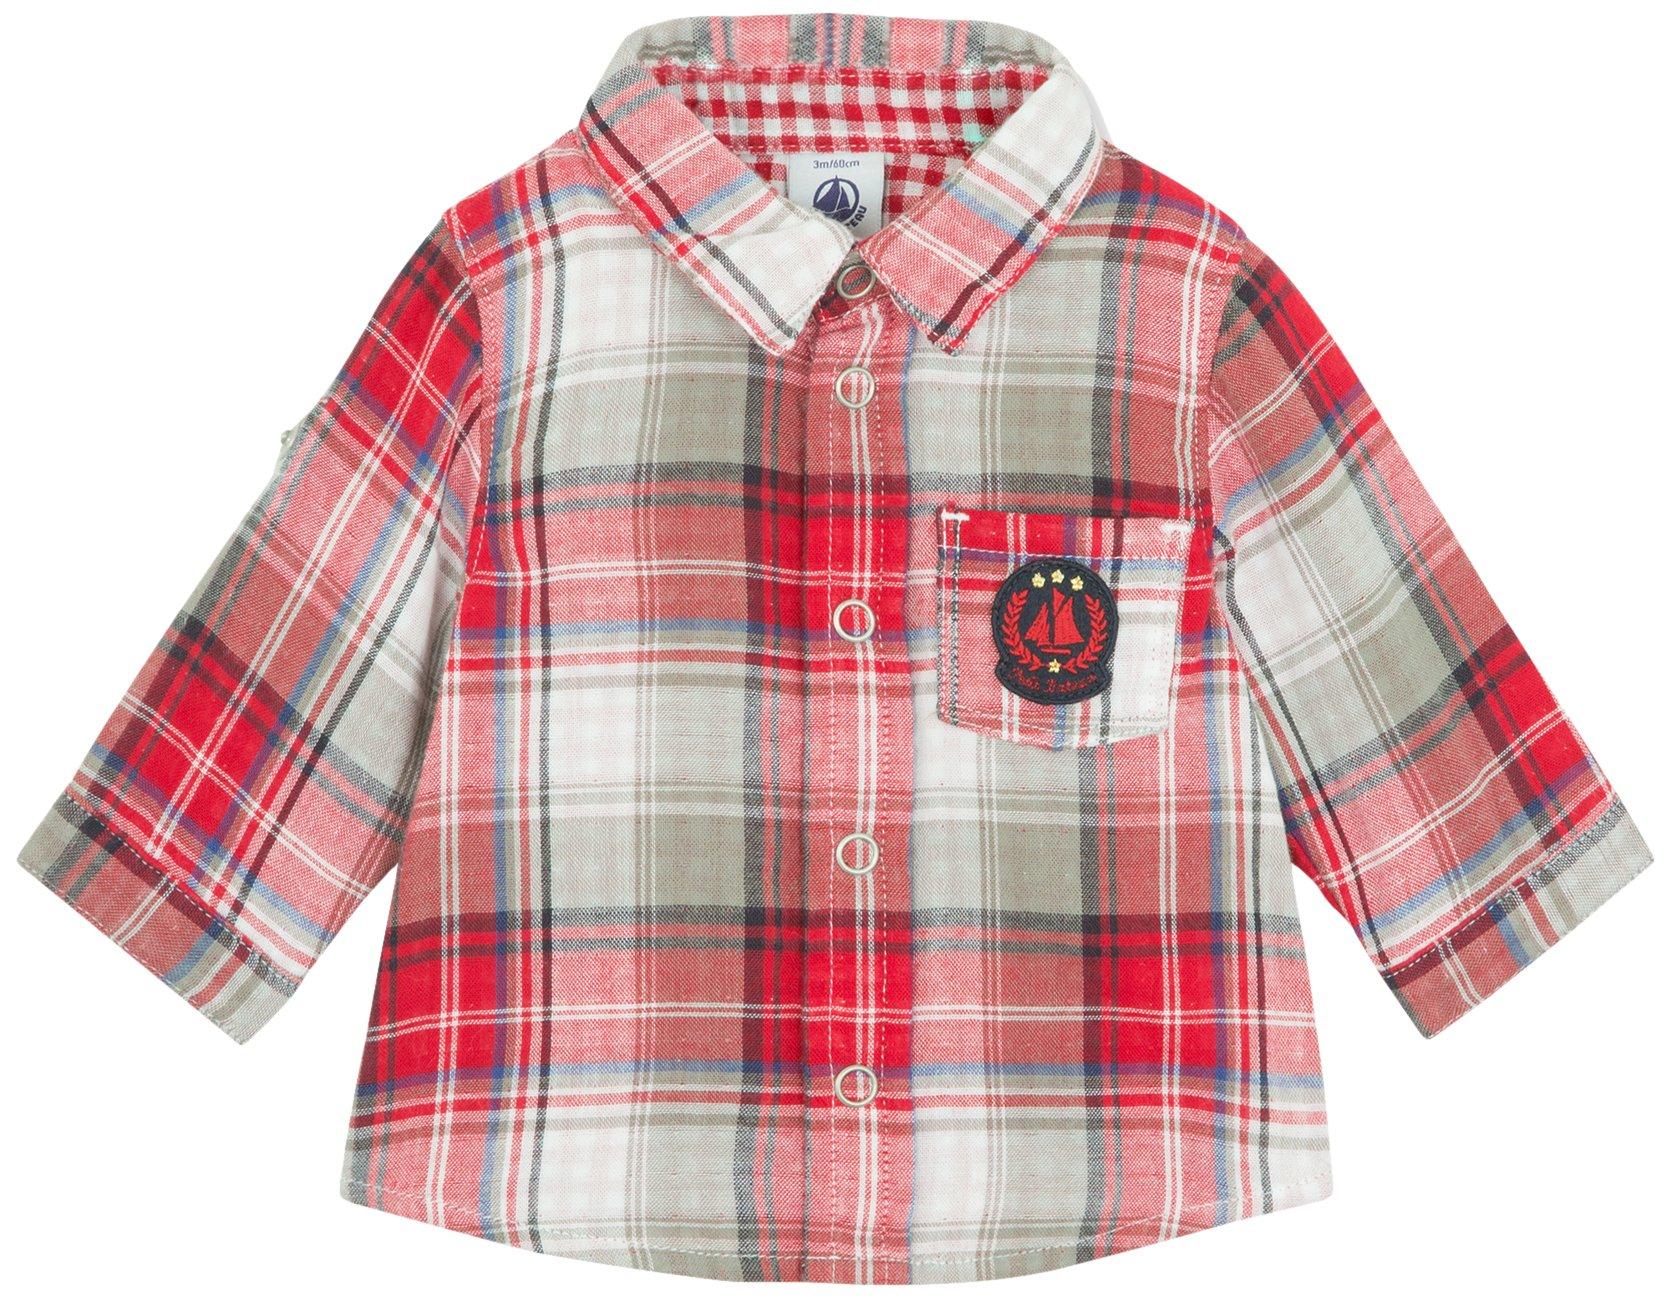 Petit Bateau Baby Boys' Check Shirt (Baby) - Red/Blue/Grey - 6 Months by Petit Bateau